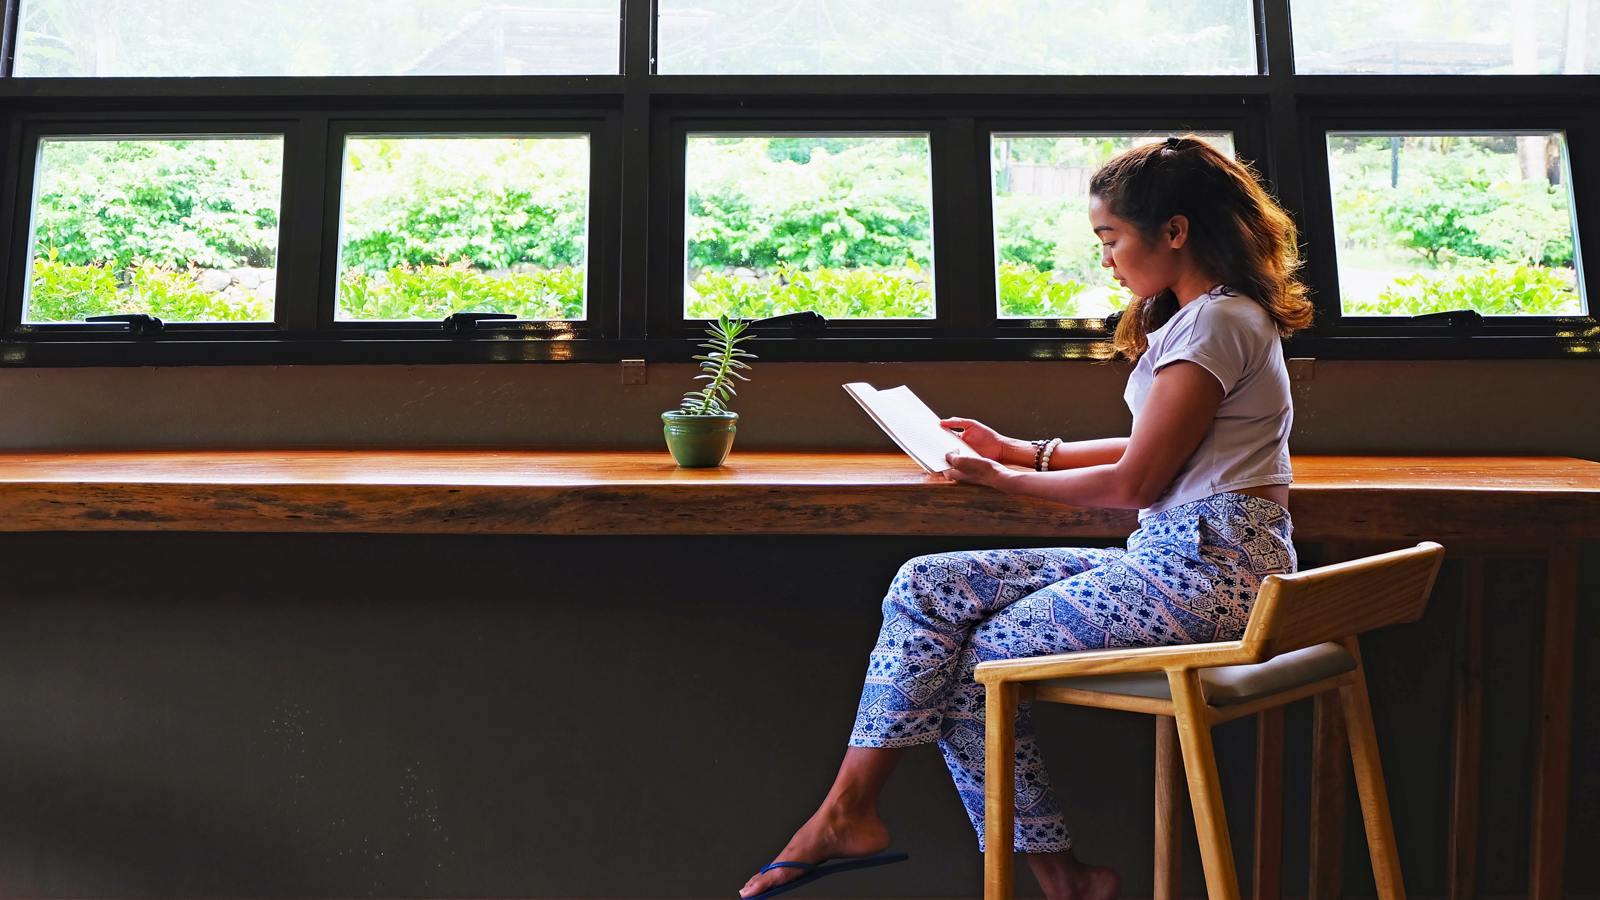 5 Easy Ways to Improve Your English Writing Skills